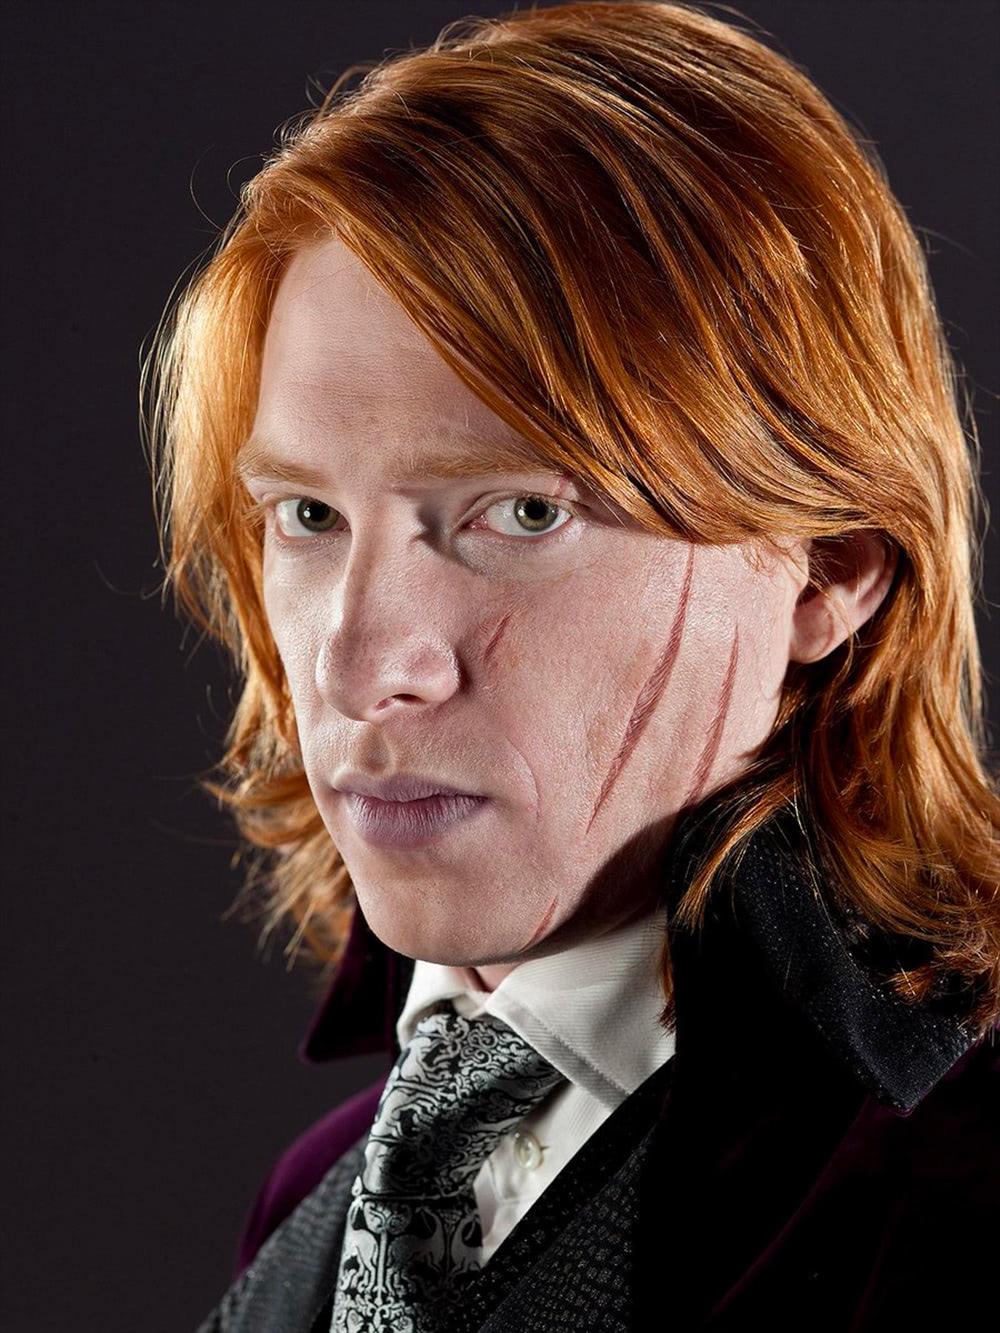 Bill Weasley wedding portrait